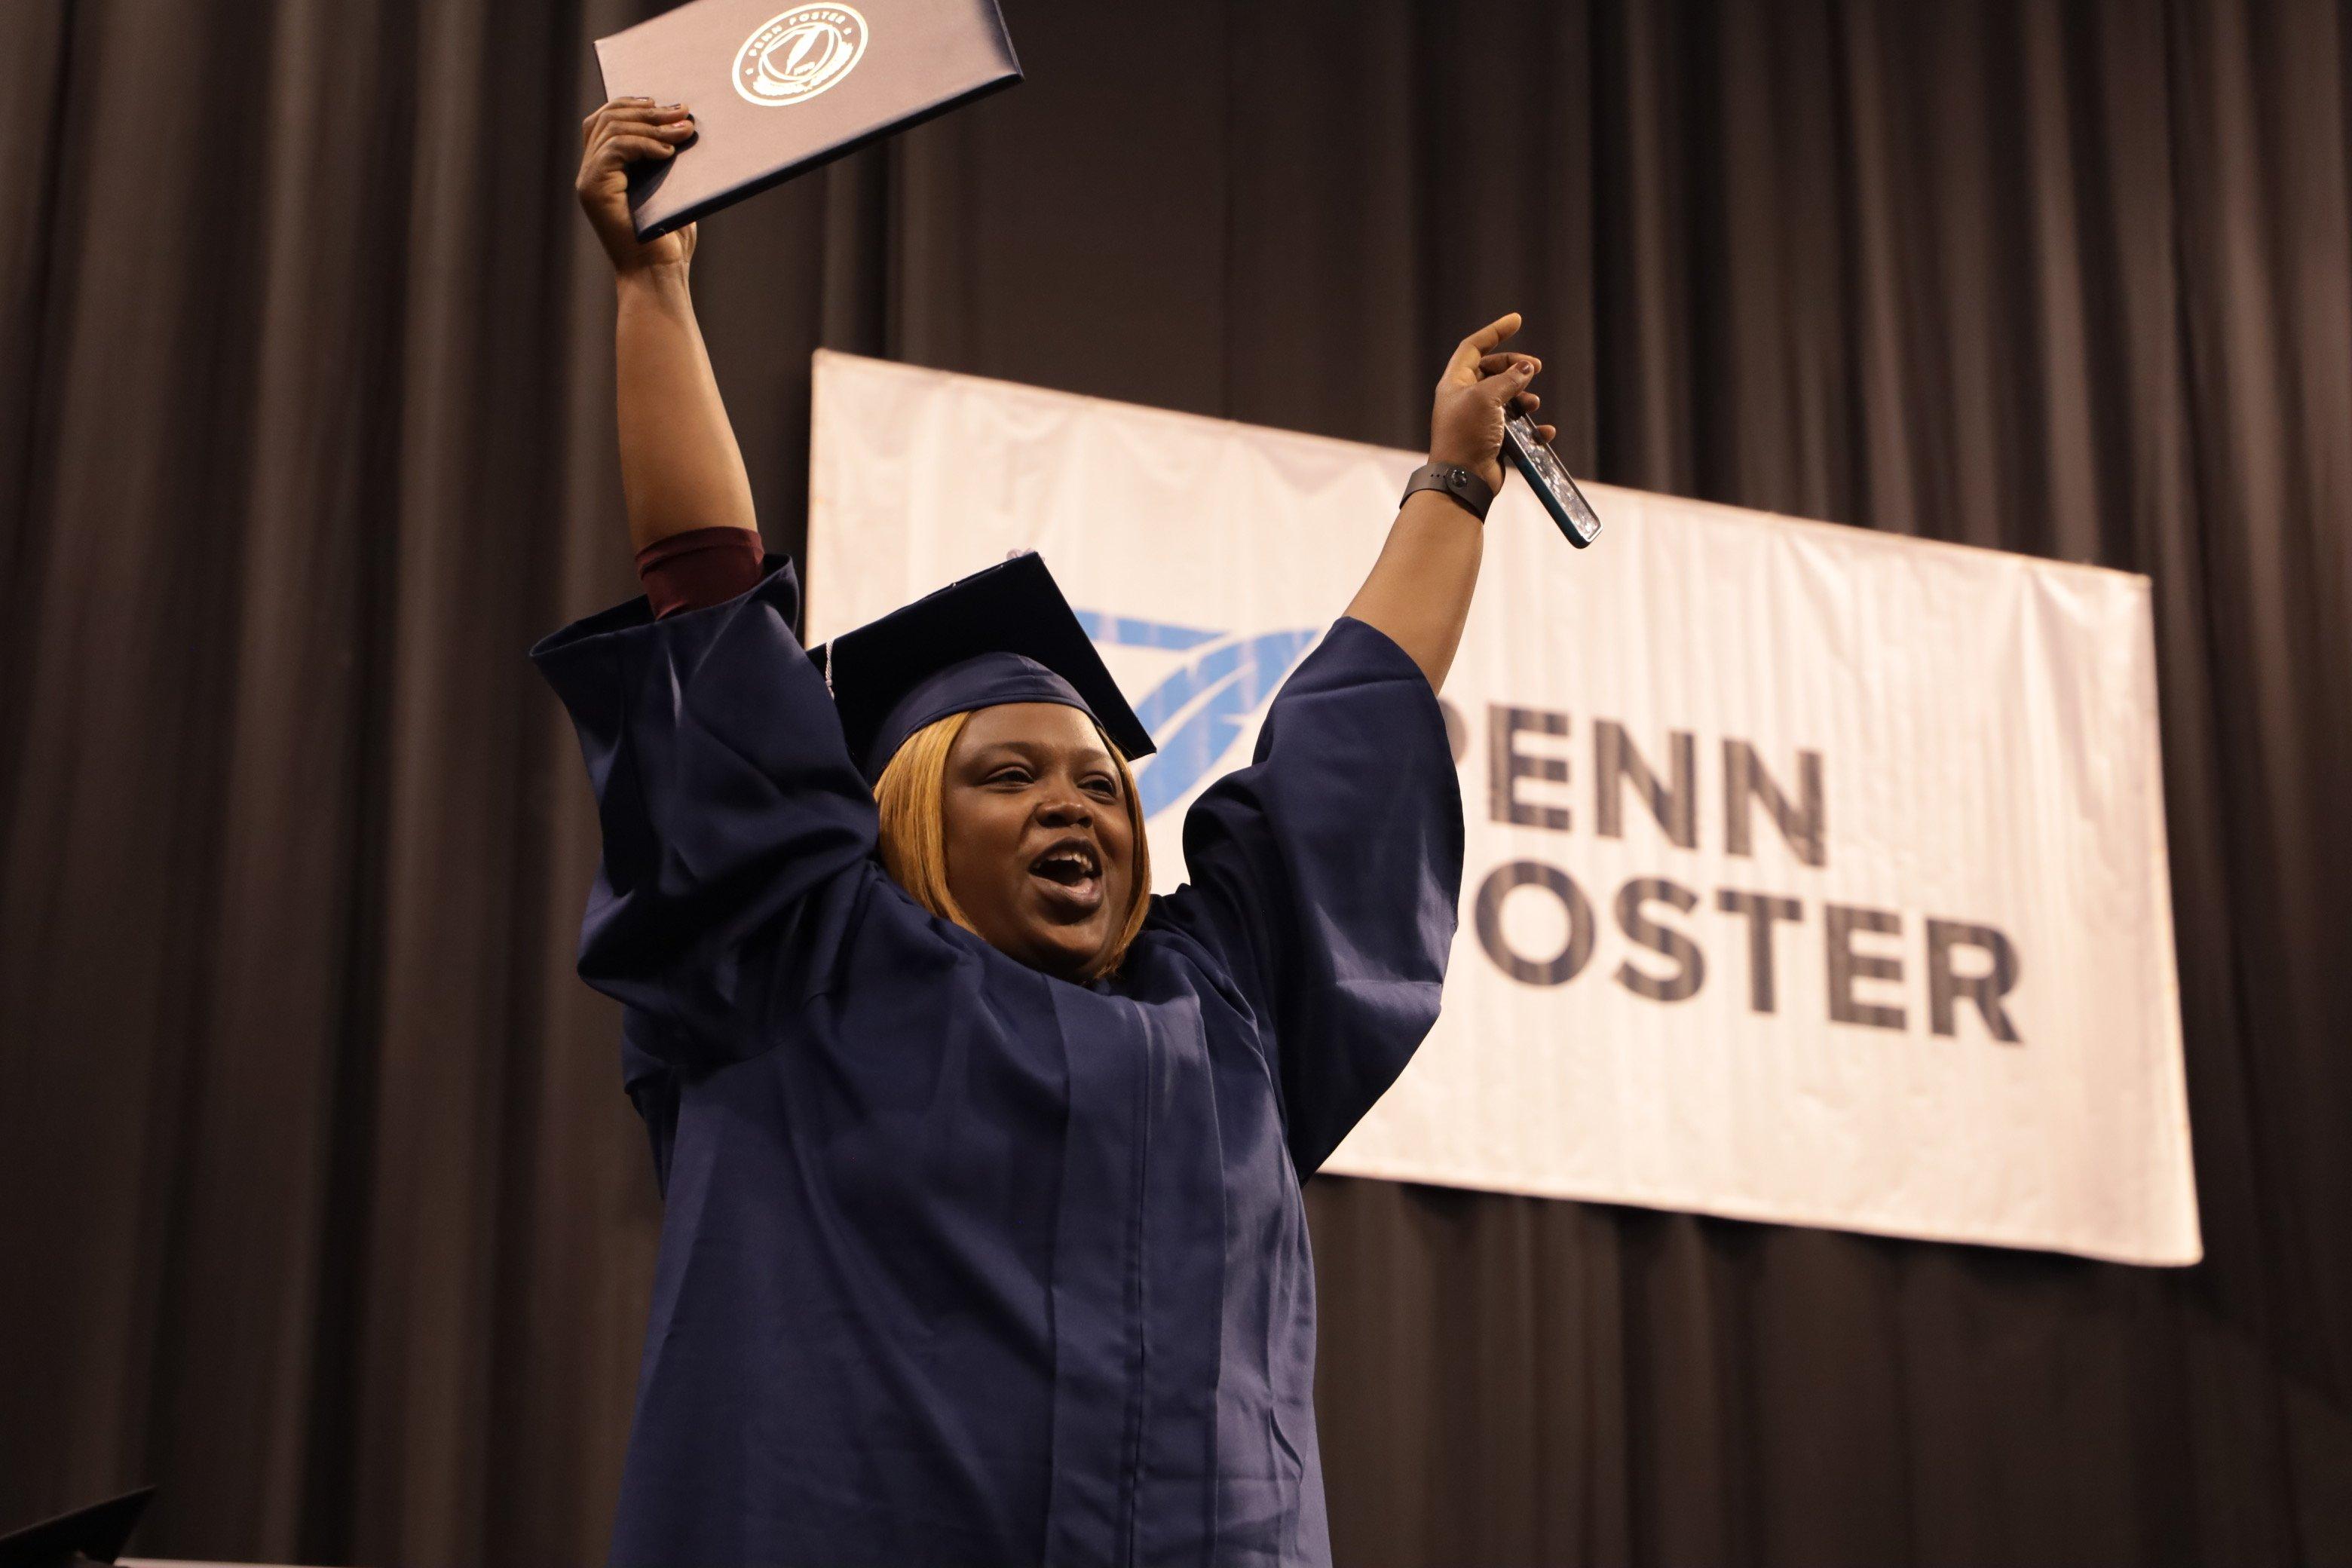 Penn Foster graduate celebrating